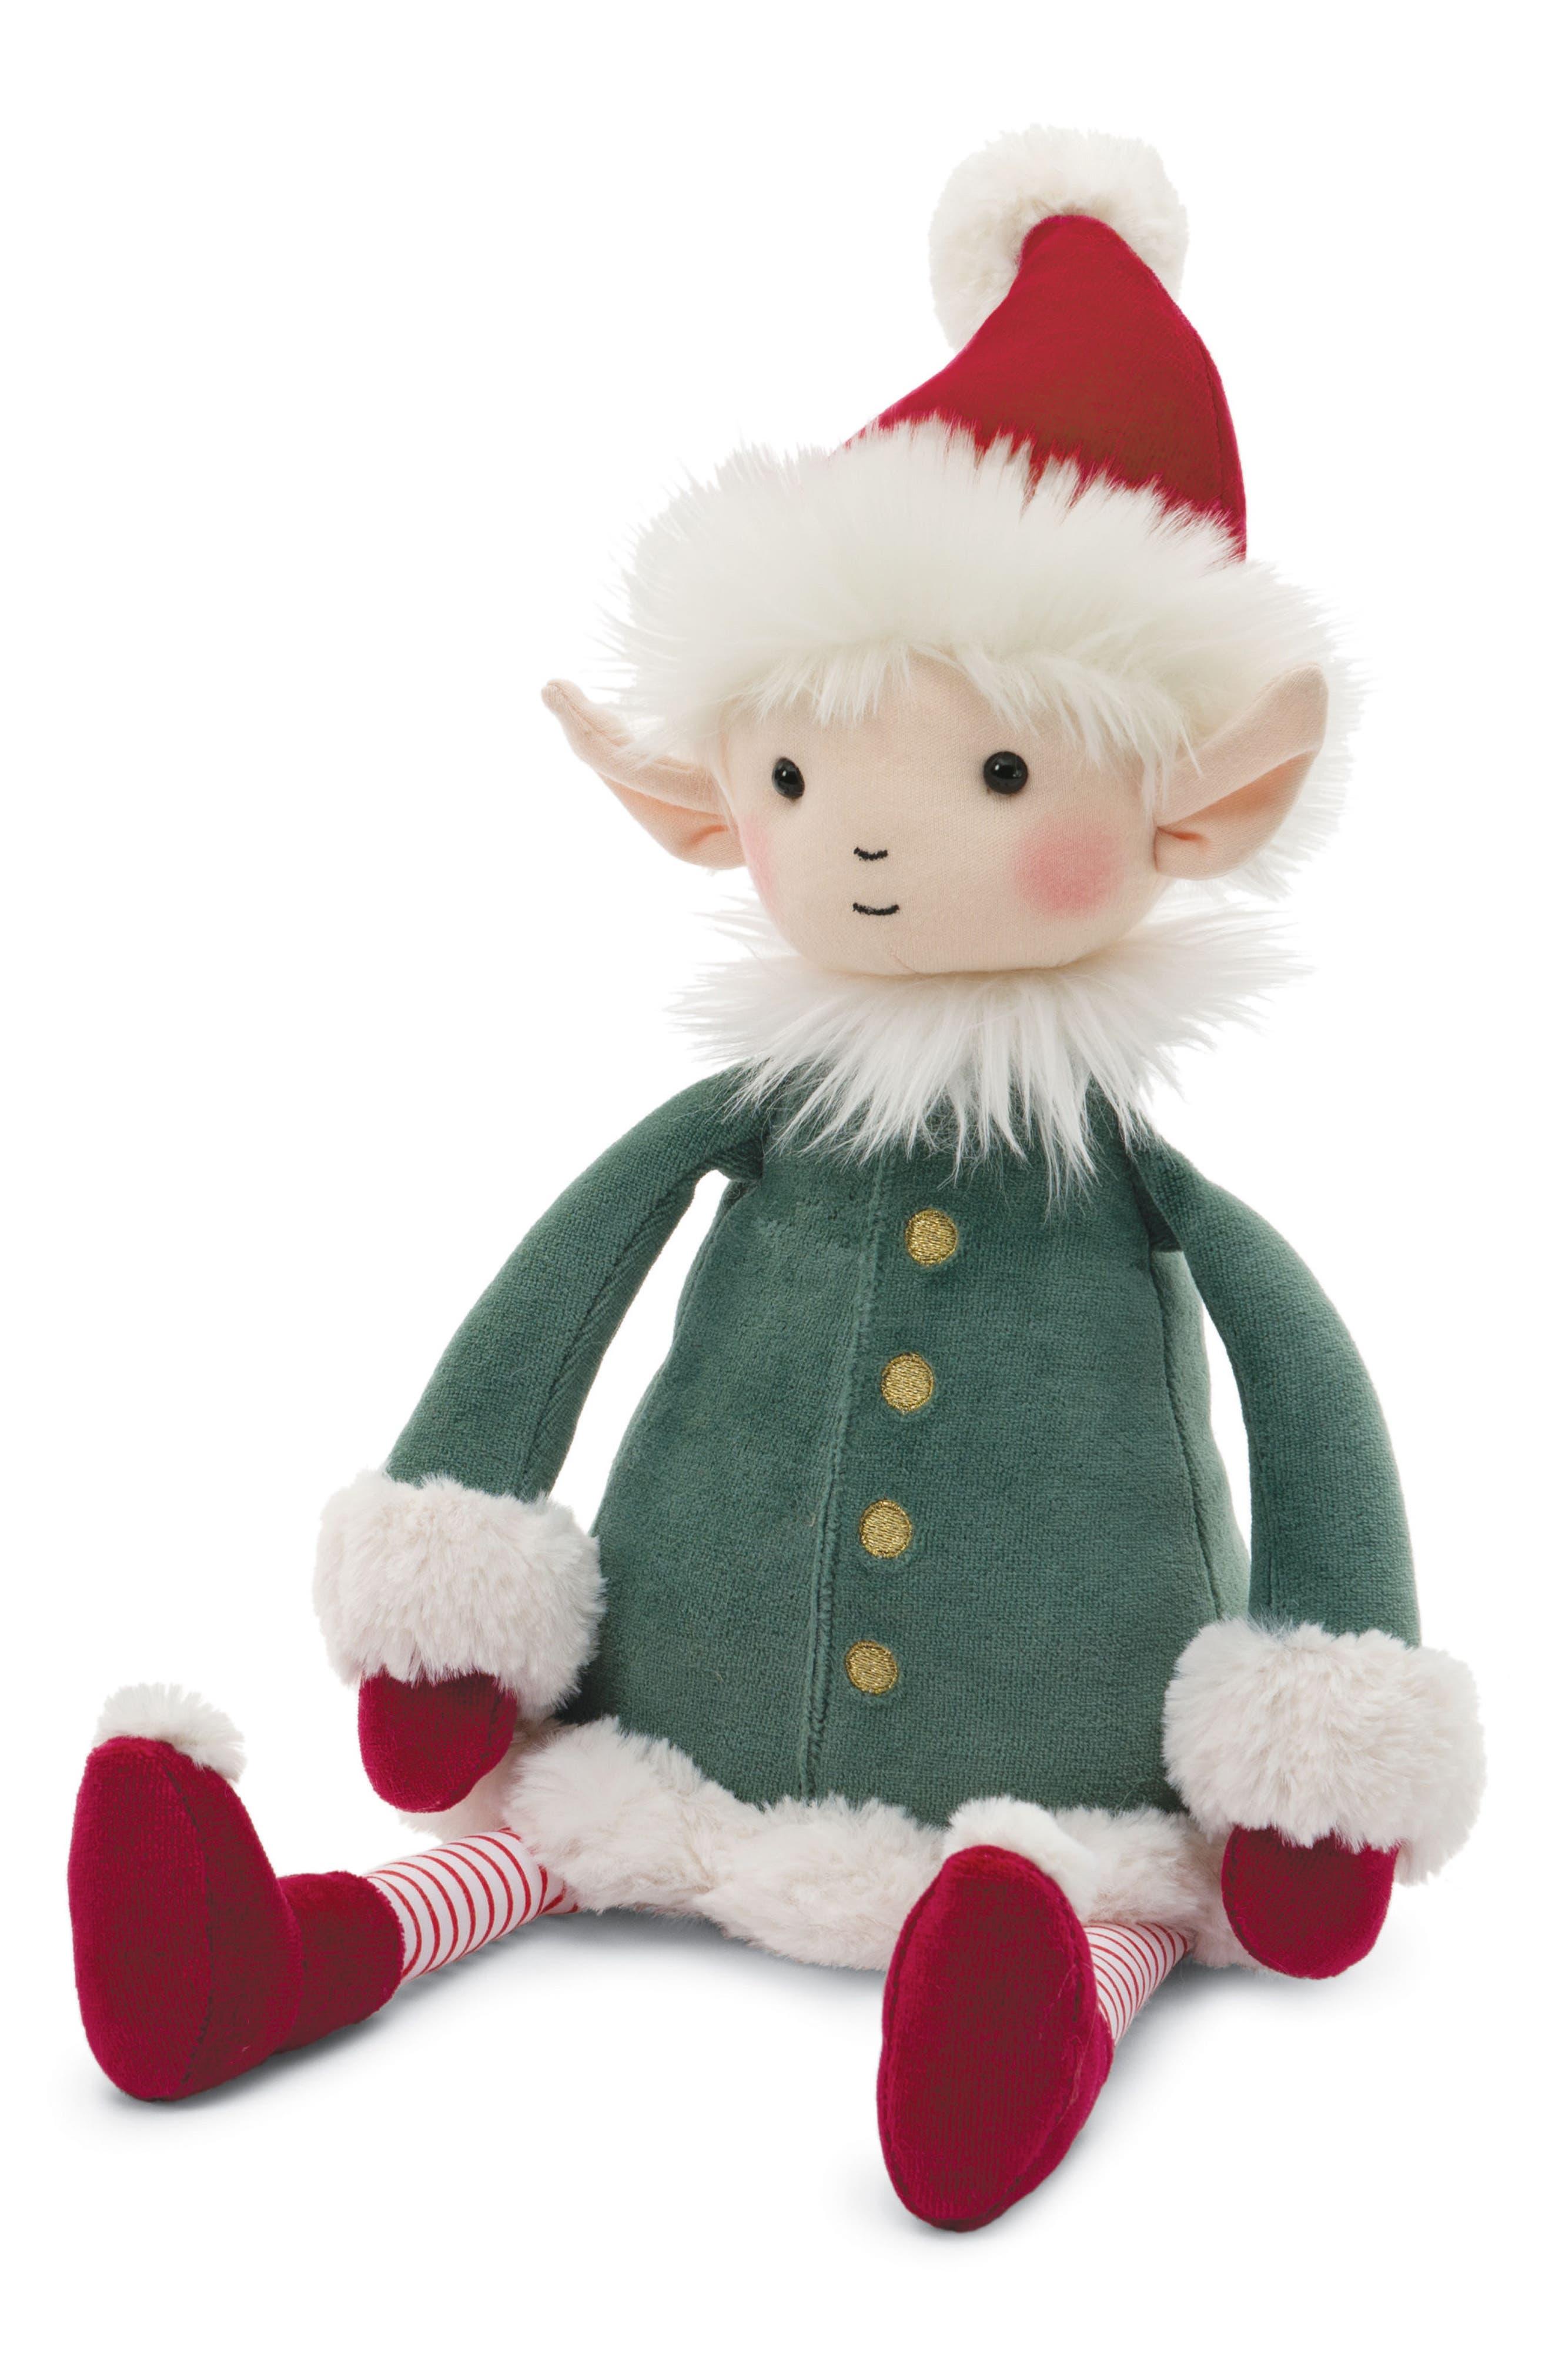 Medium Elf Stuffed Doll,                         Main,                         color, Green/ Red